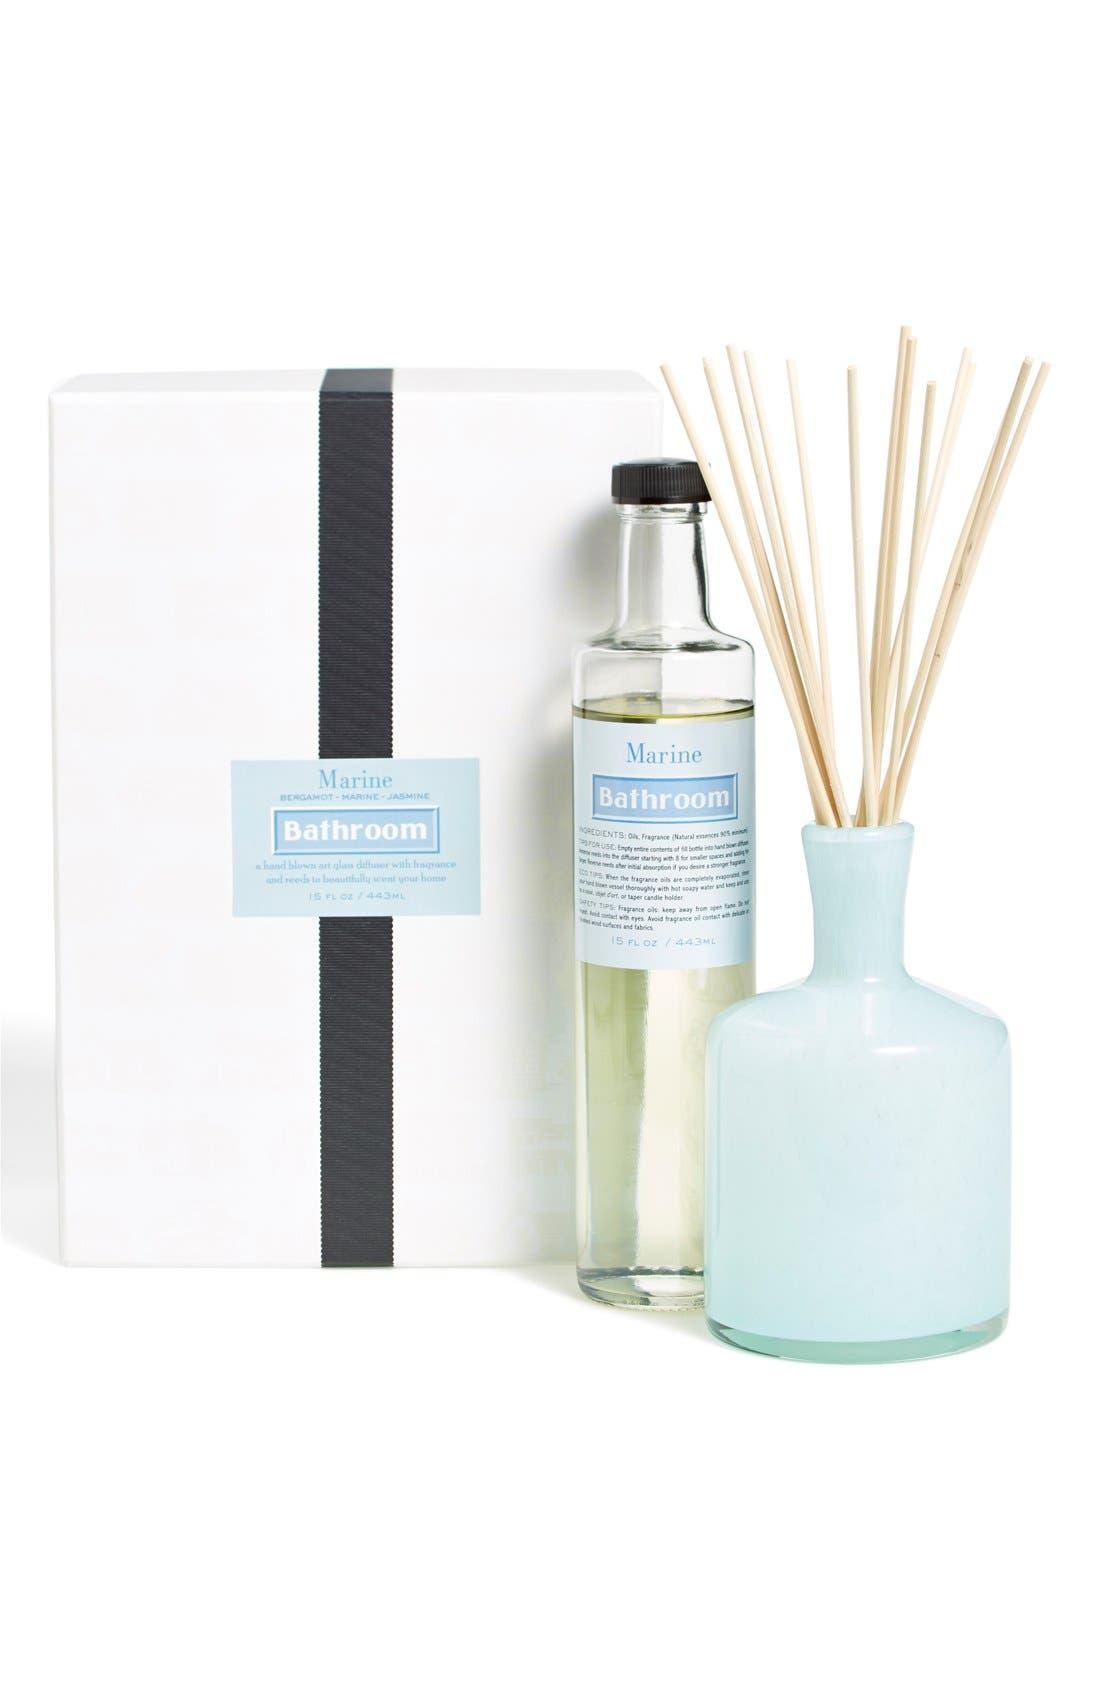 'Marine - Bathroom' Fragrance Diffuser,                             Alternate thumbnail 2, color,                             NO COLOR